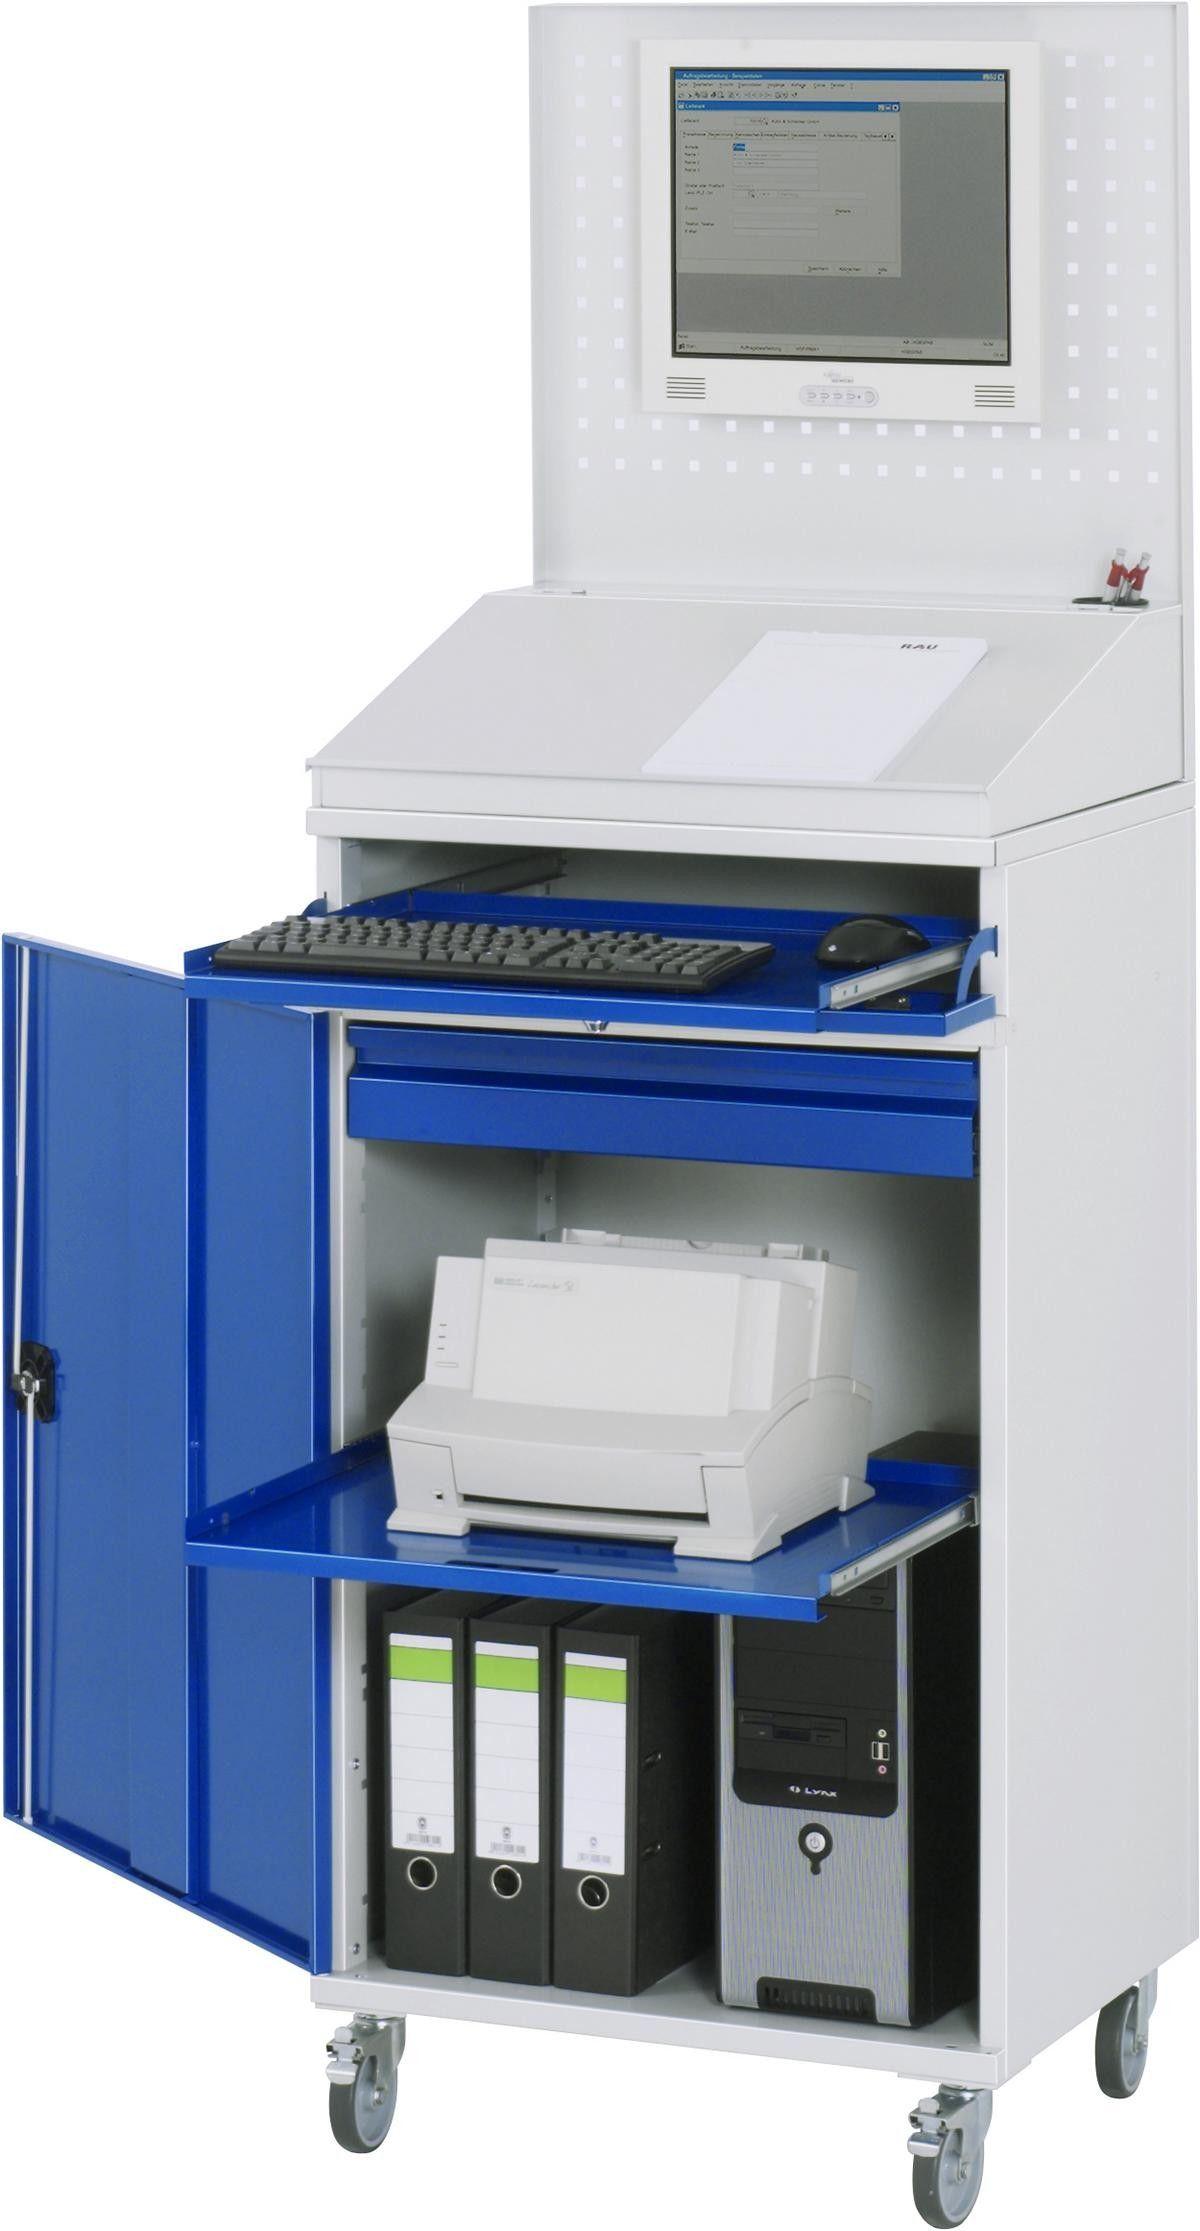 Computer Schrank Modell 61 650x520x1895mm Fahrbar Gtardo De In 2020 Schliessfacher Schrank Computer